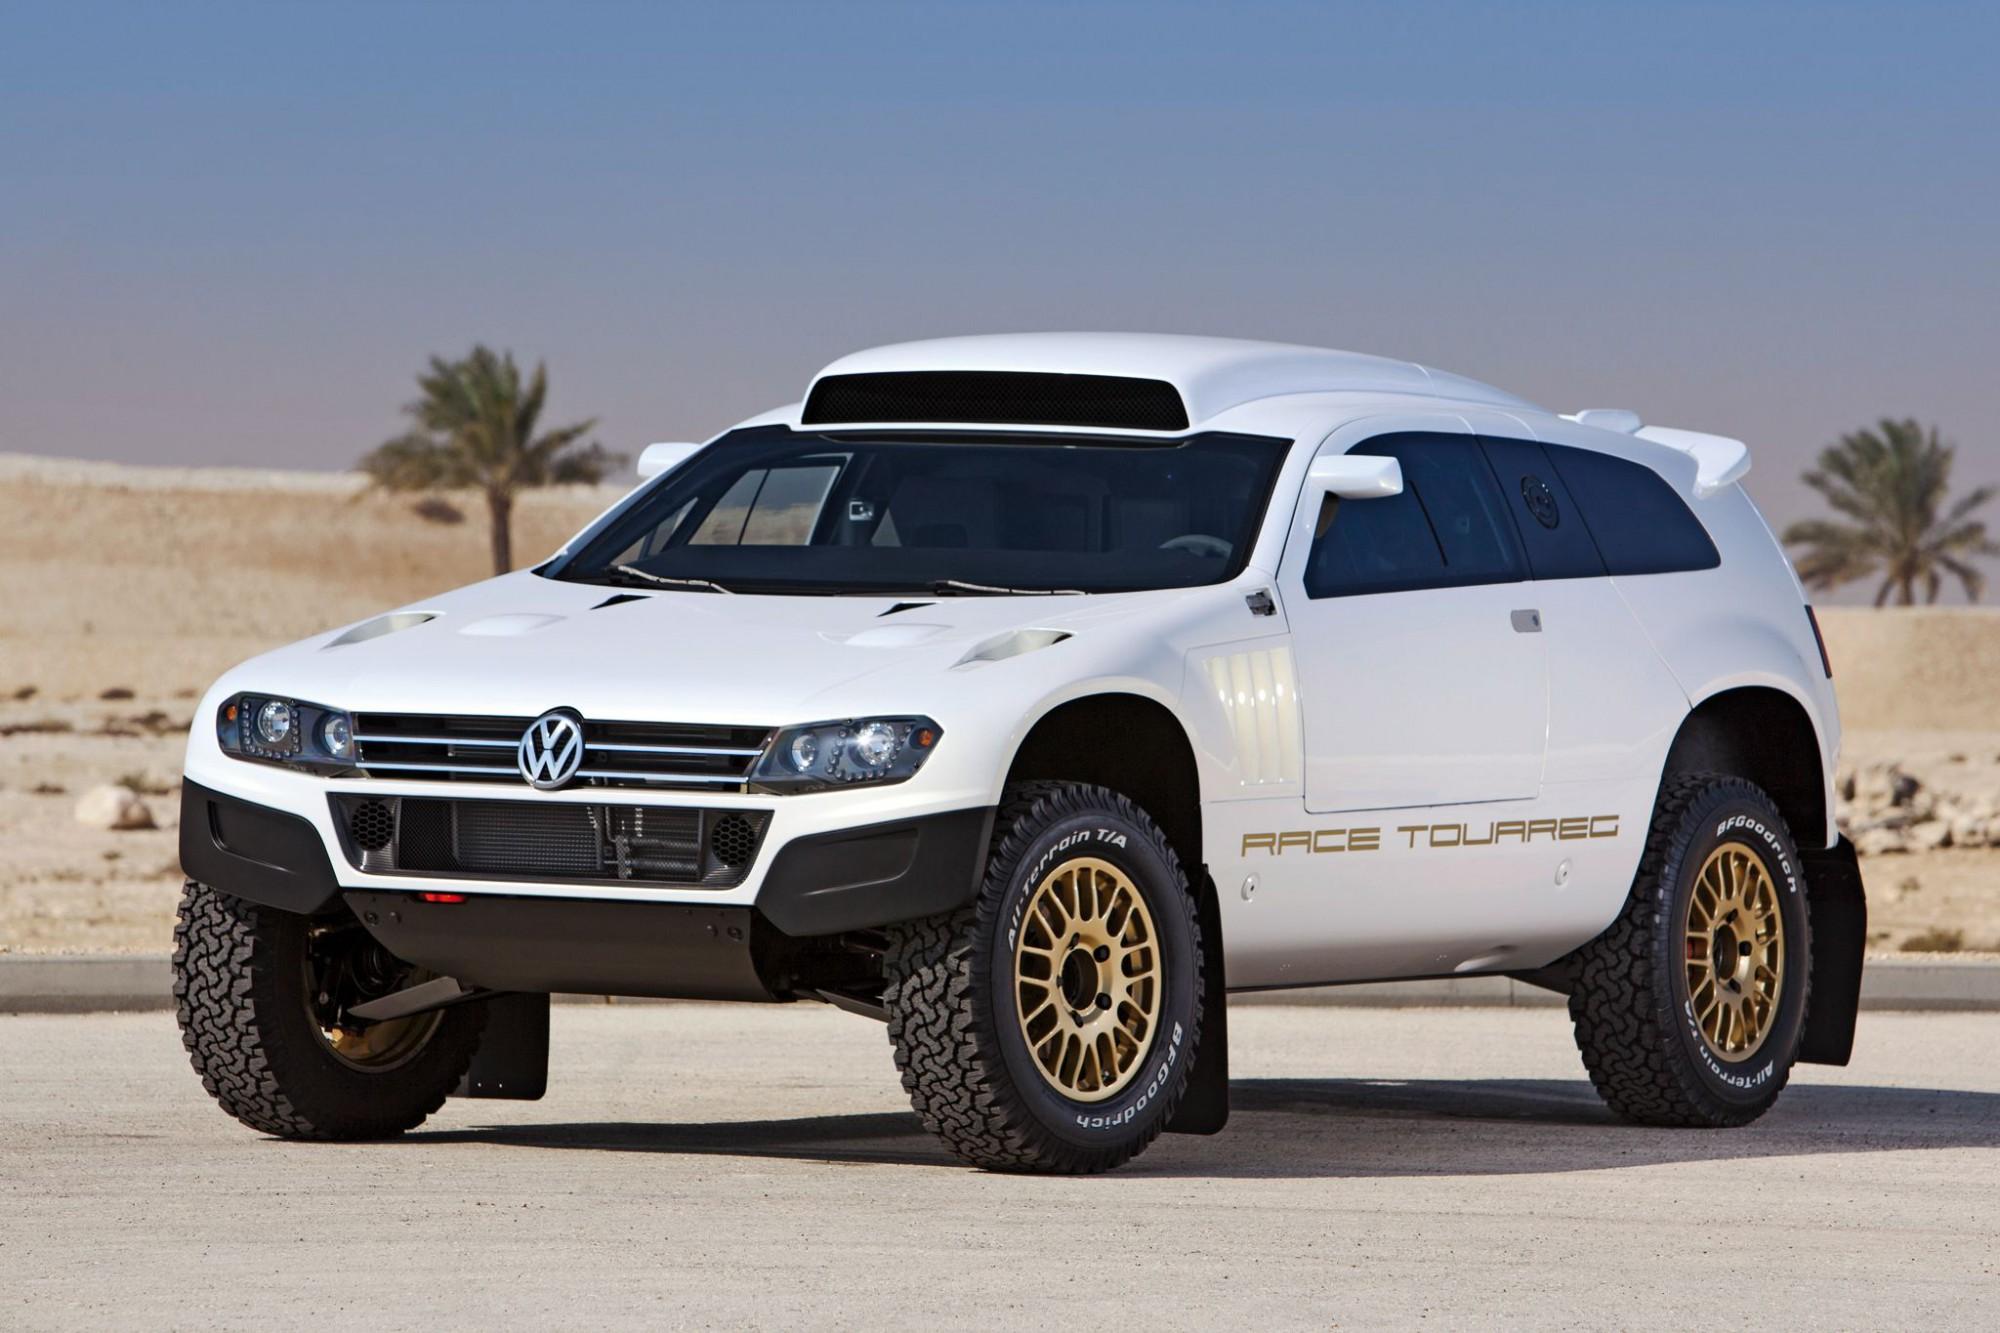 volkswagen_race_touareg_3_qatar_concept_9